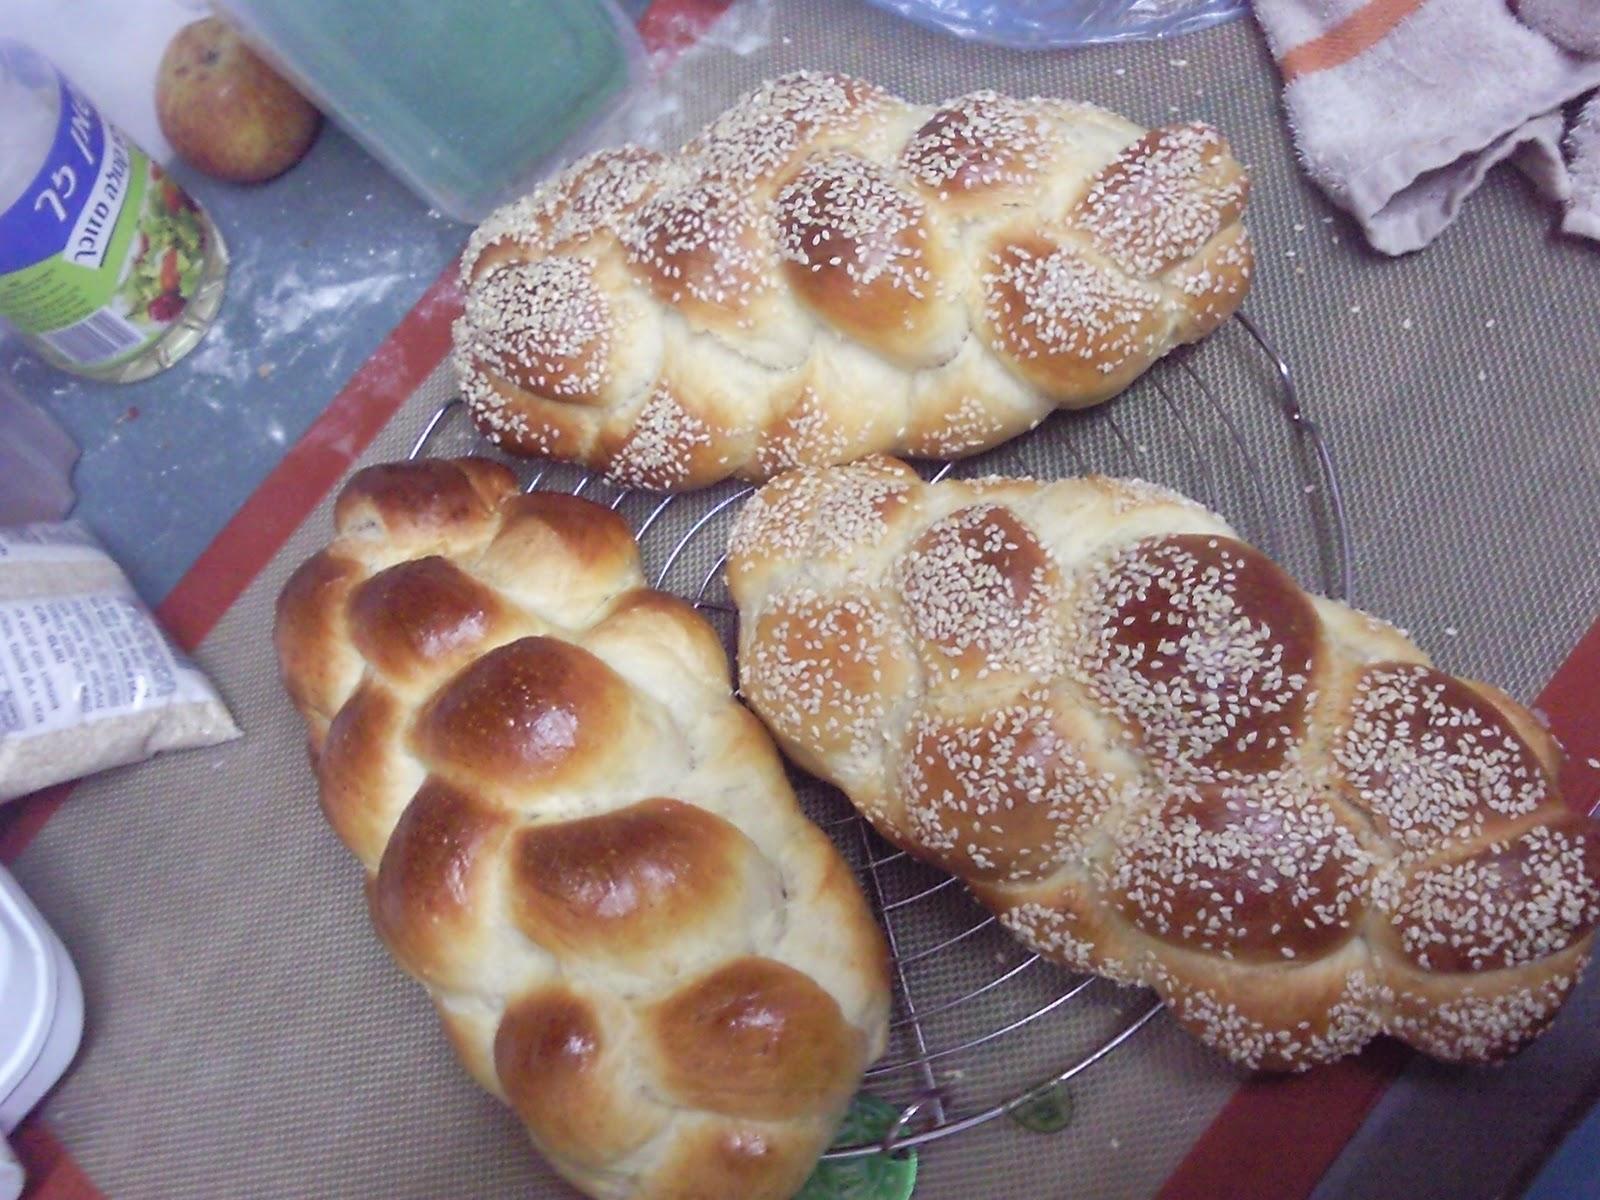 Pistachio And Strawberry Mousse Mille Feuilles Recipes — Dishmaps